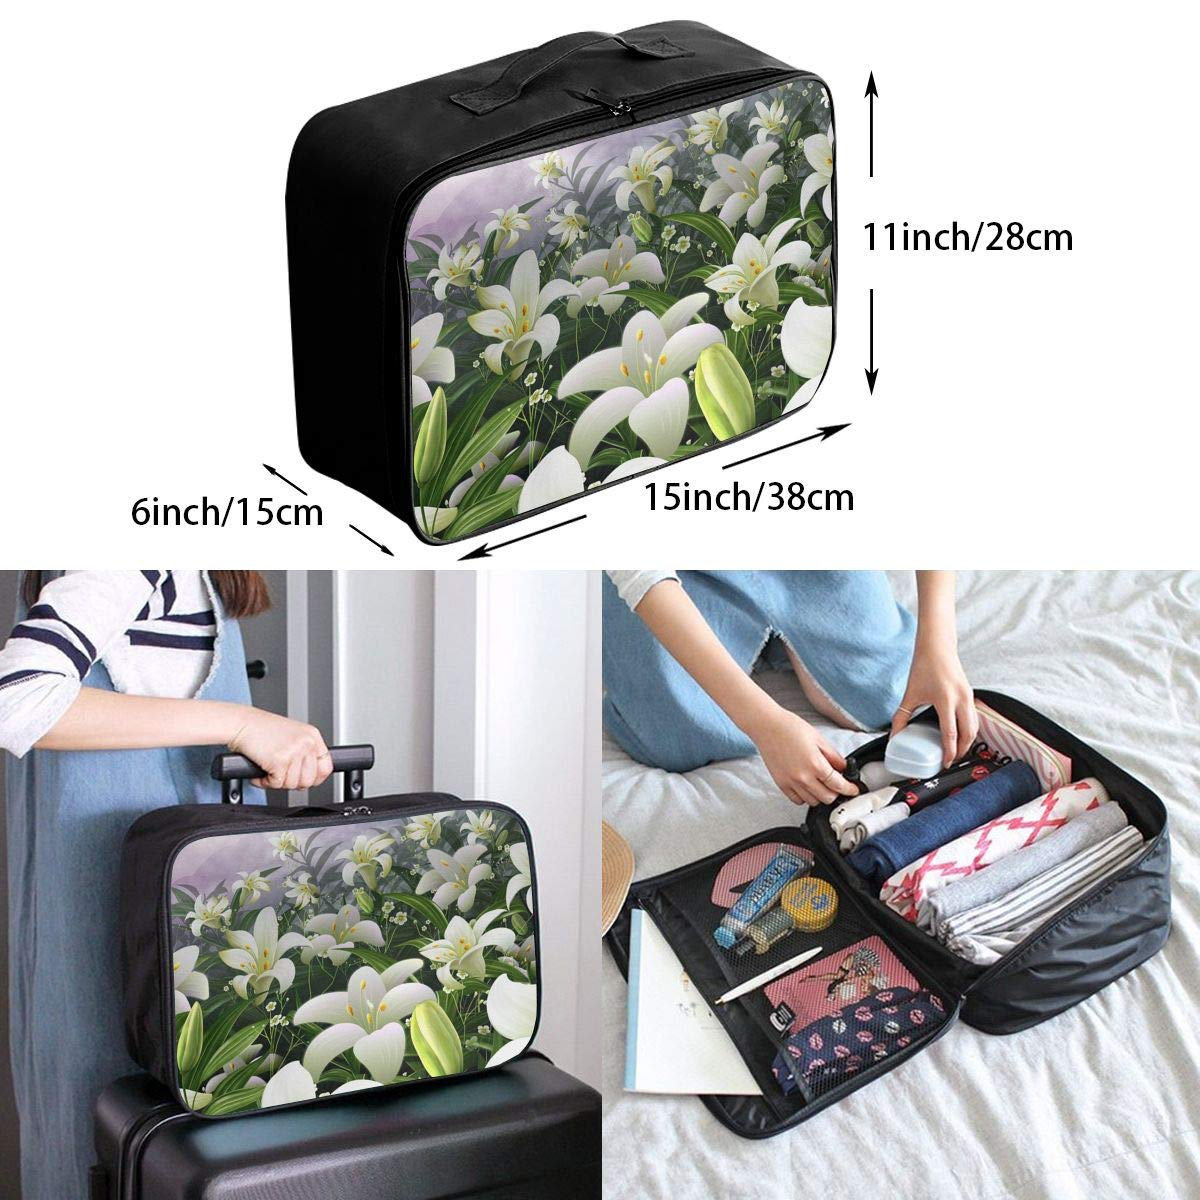 Travel Luggage Duffle Bag Lightweight Portable Handbag Lily Flowers Print Large Capacity Waterproof Foldable Storage Tote